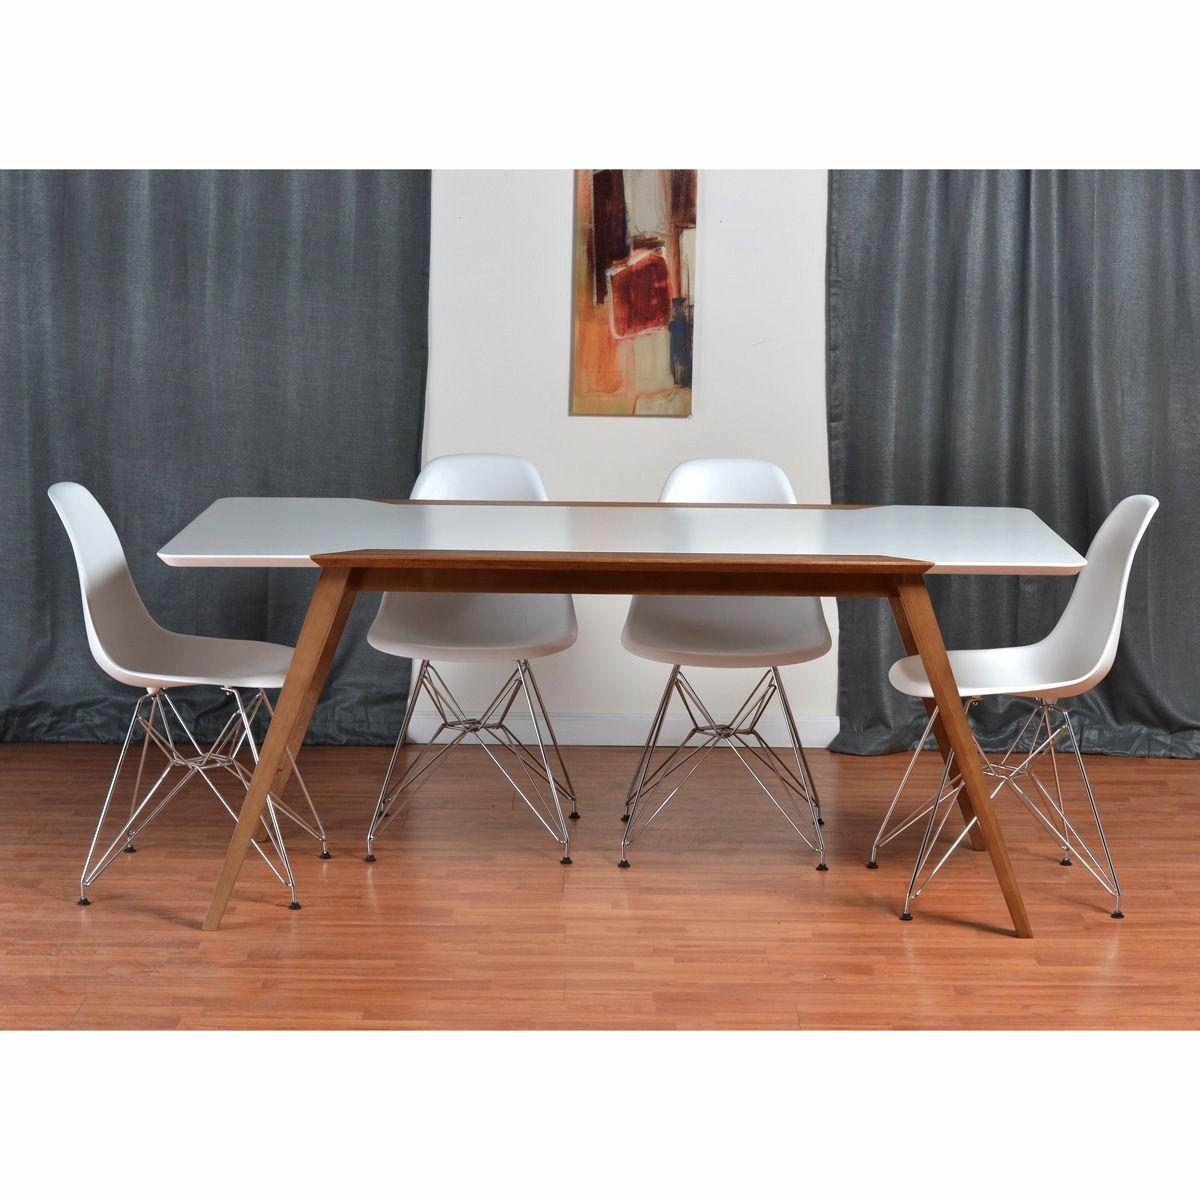 Econatura Fredrik  Eiffel 5Piece Dining Set  Side Chair Mesmerizing Side Chairs Dining Room 2018